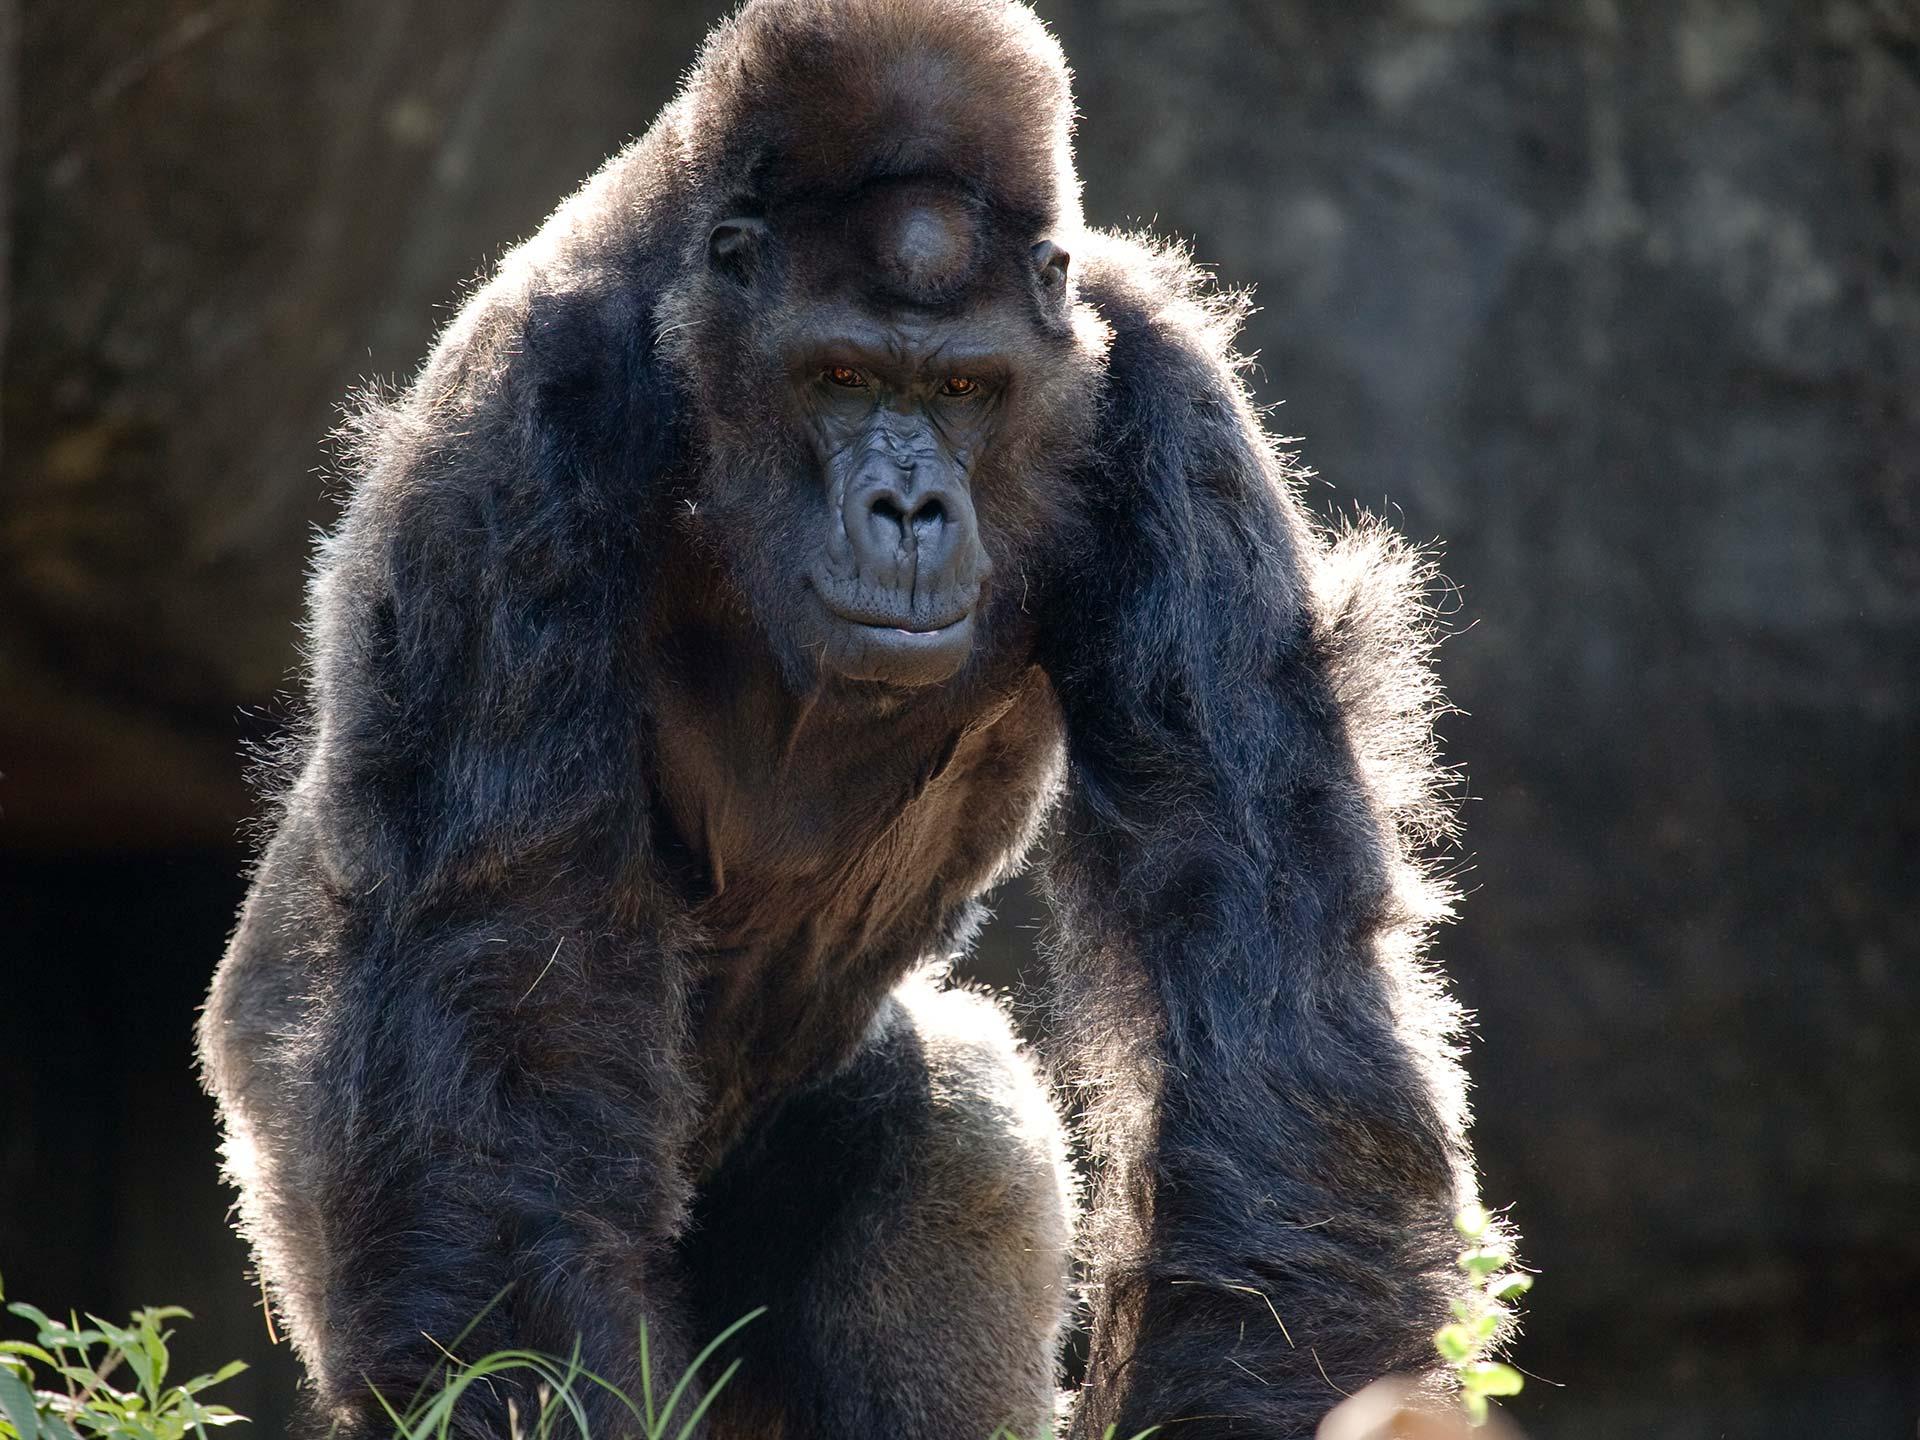 The Urban Gorilla